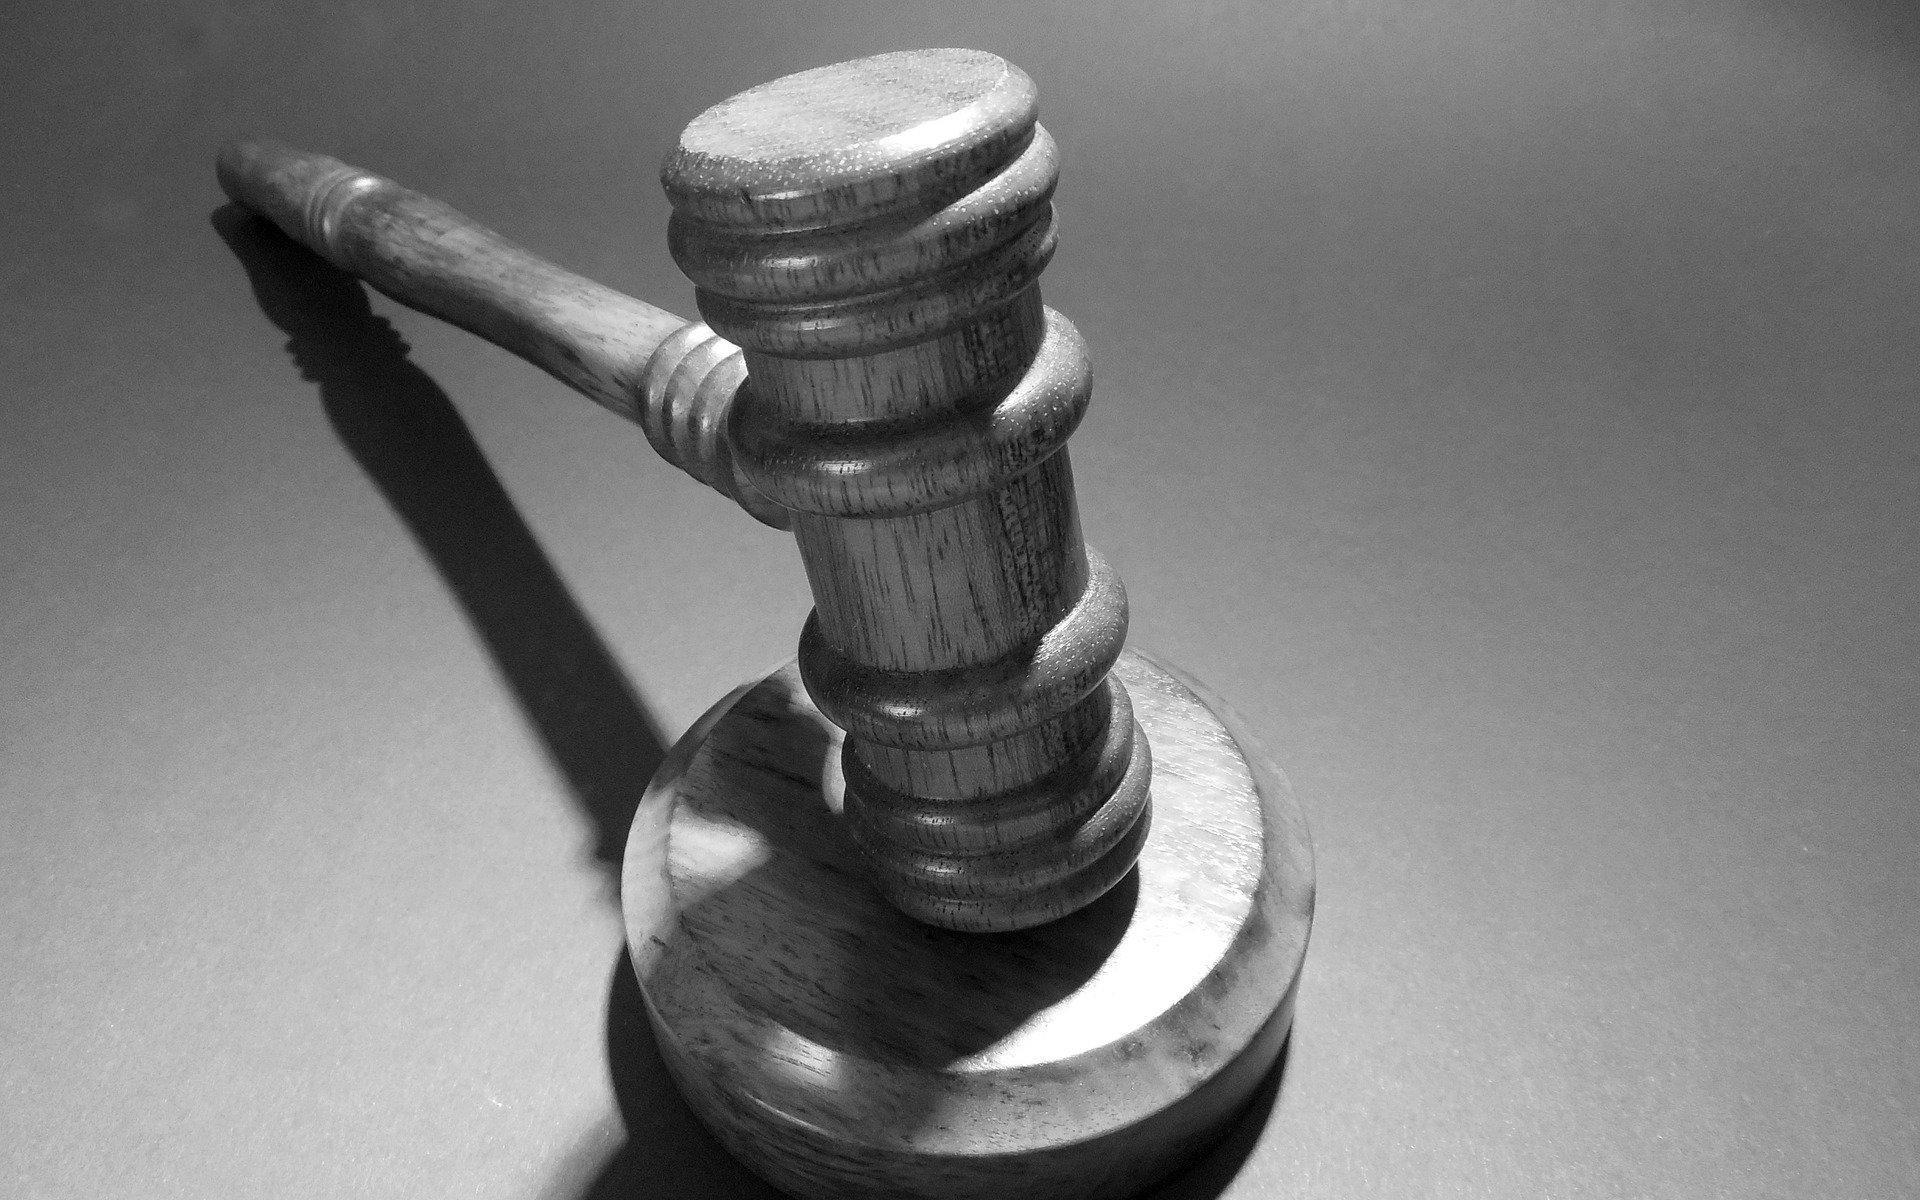 US Marshals auctioning 2170 bitcoins